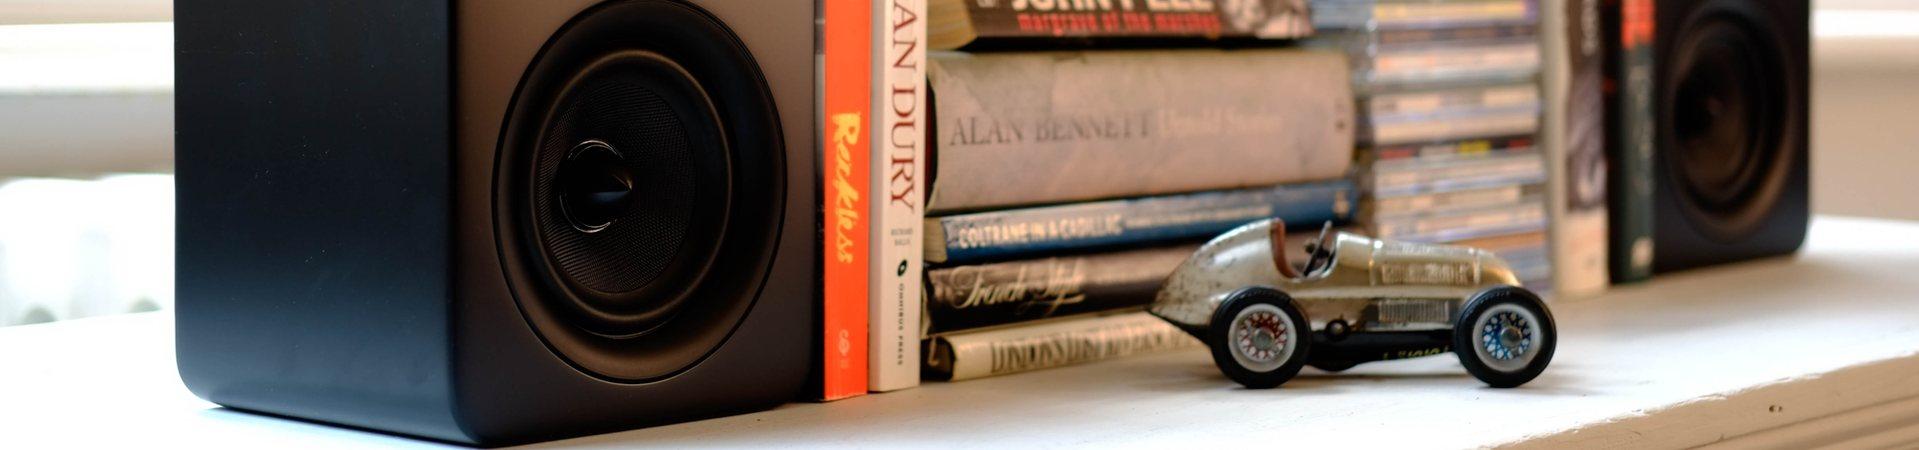 roth_lifestyle_speaker_bookshelf